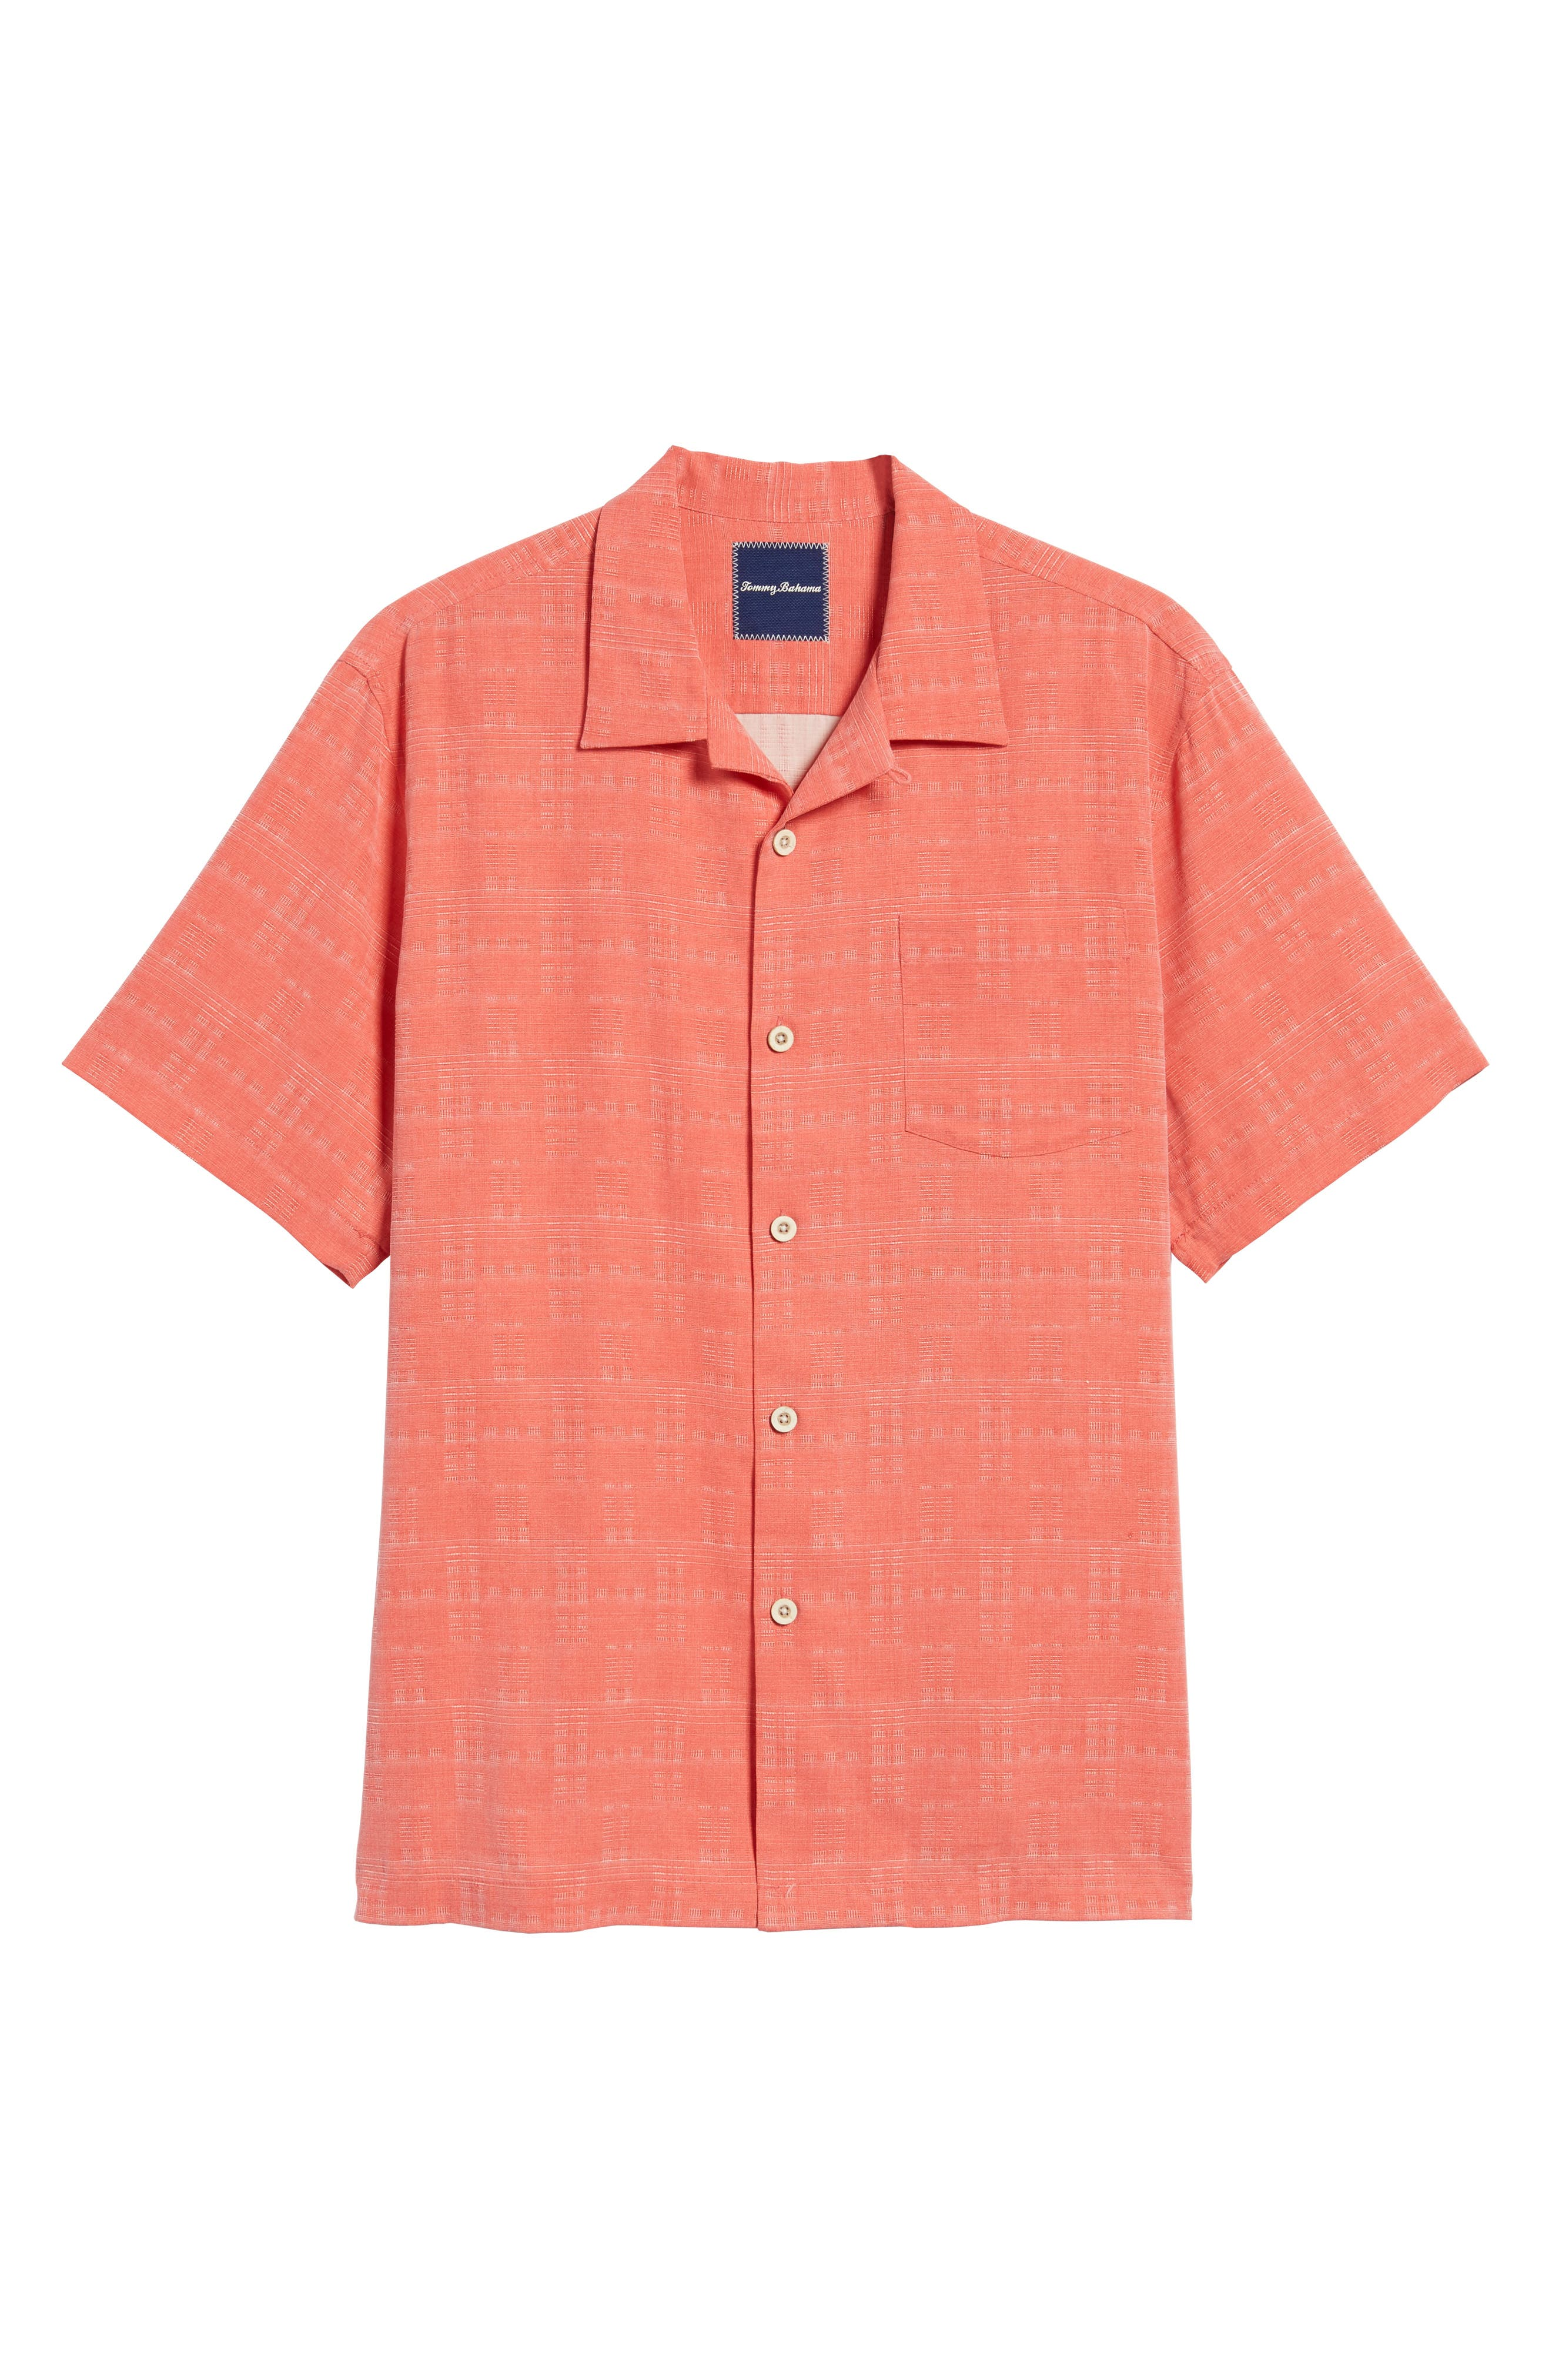 Main Image - Tommy Bahama 'Geo-Rific Jacquard' Original Fit Silk Camp Shirt